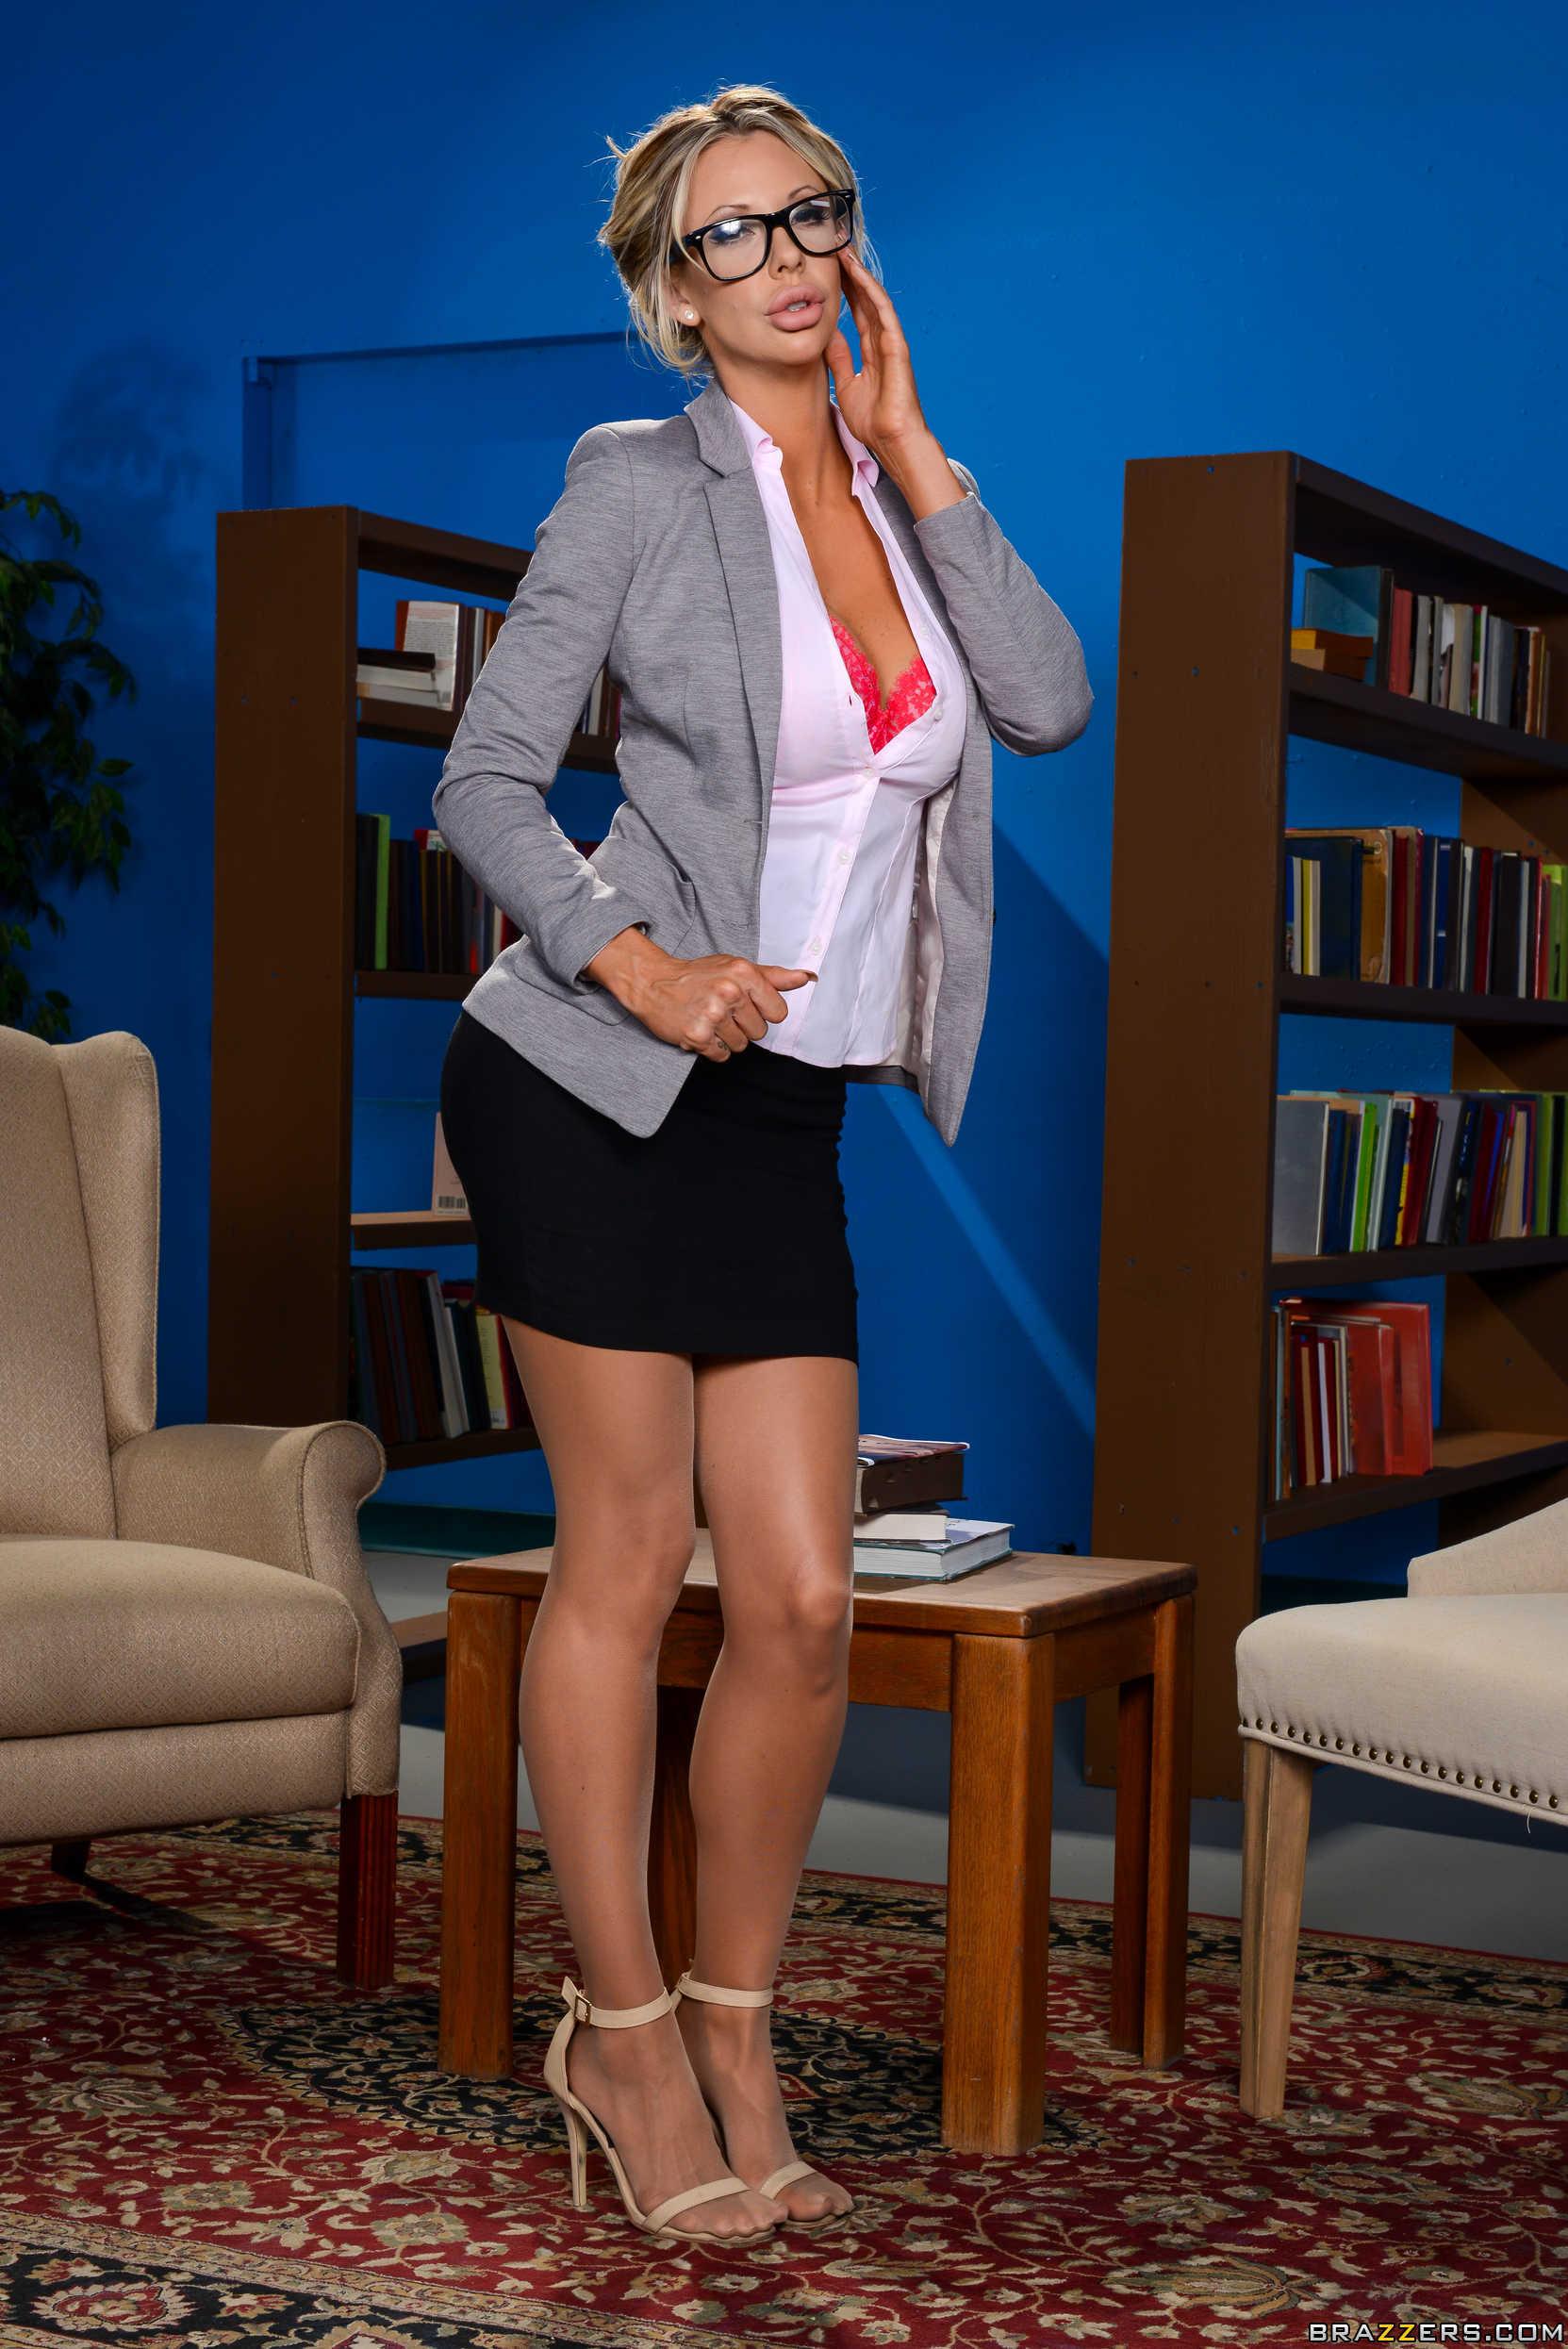 Courtney Taylor - la profesora rubia muestra su conchita